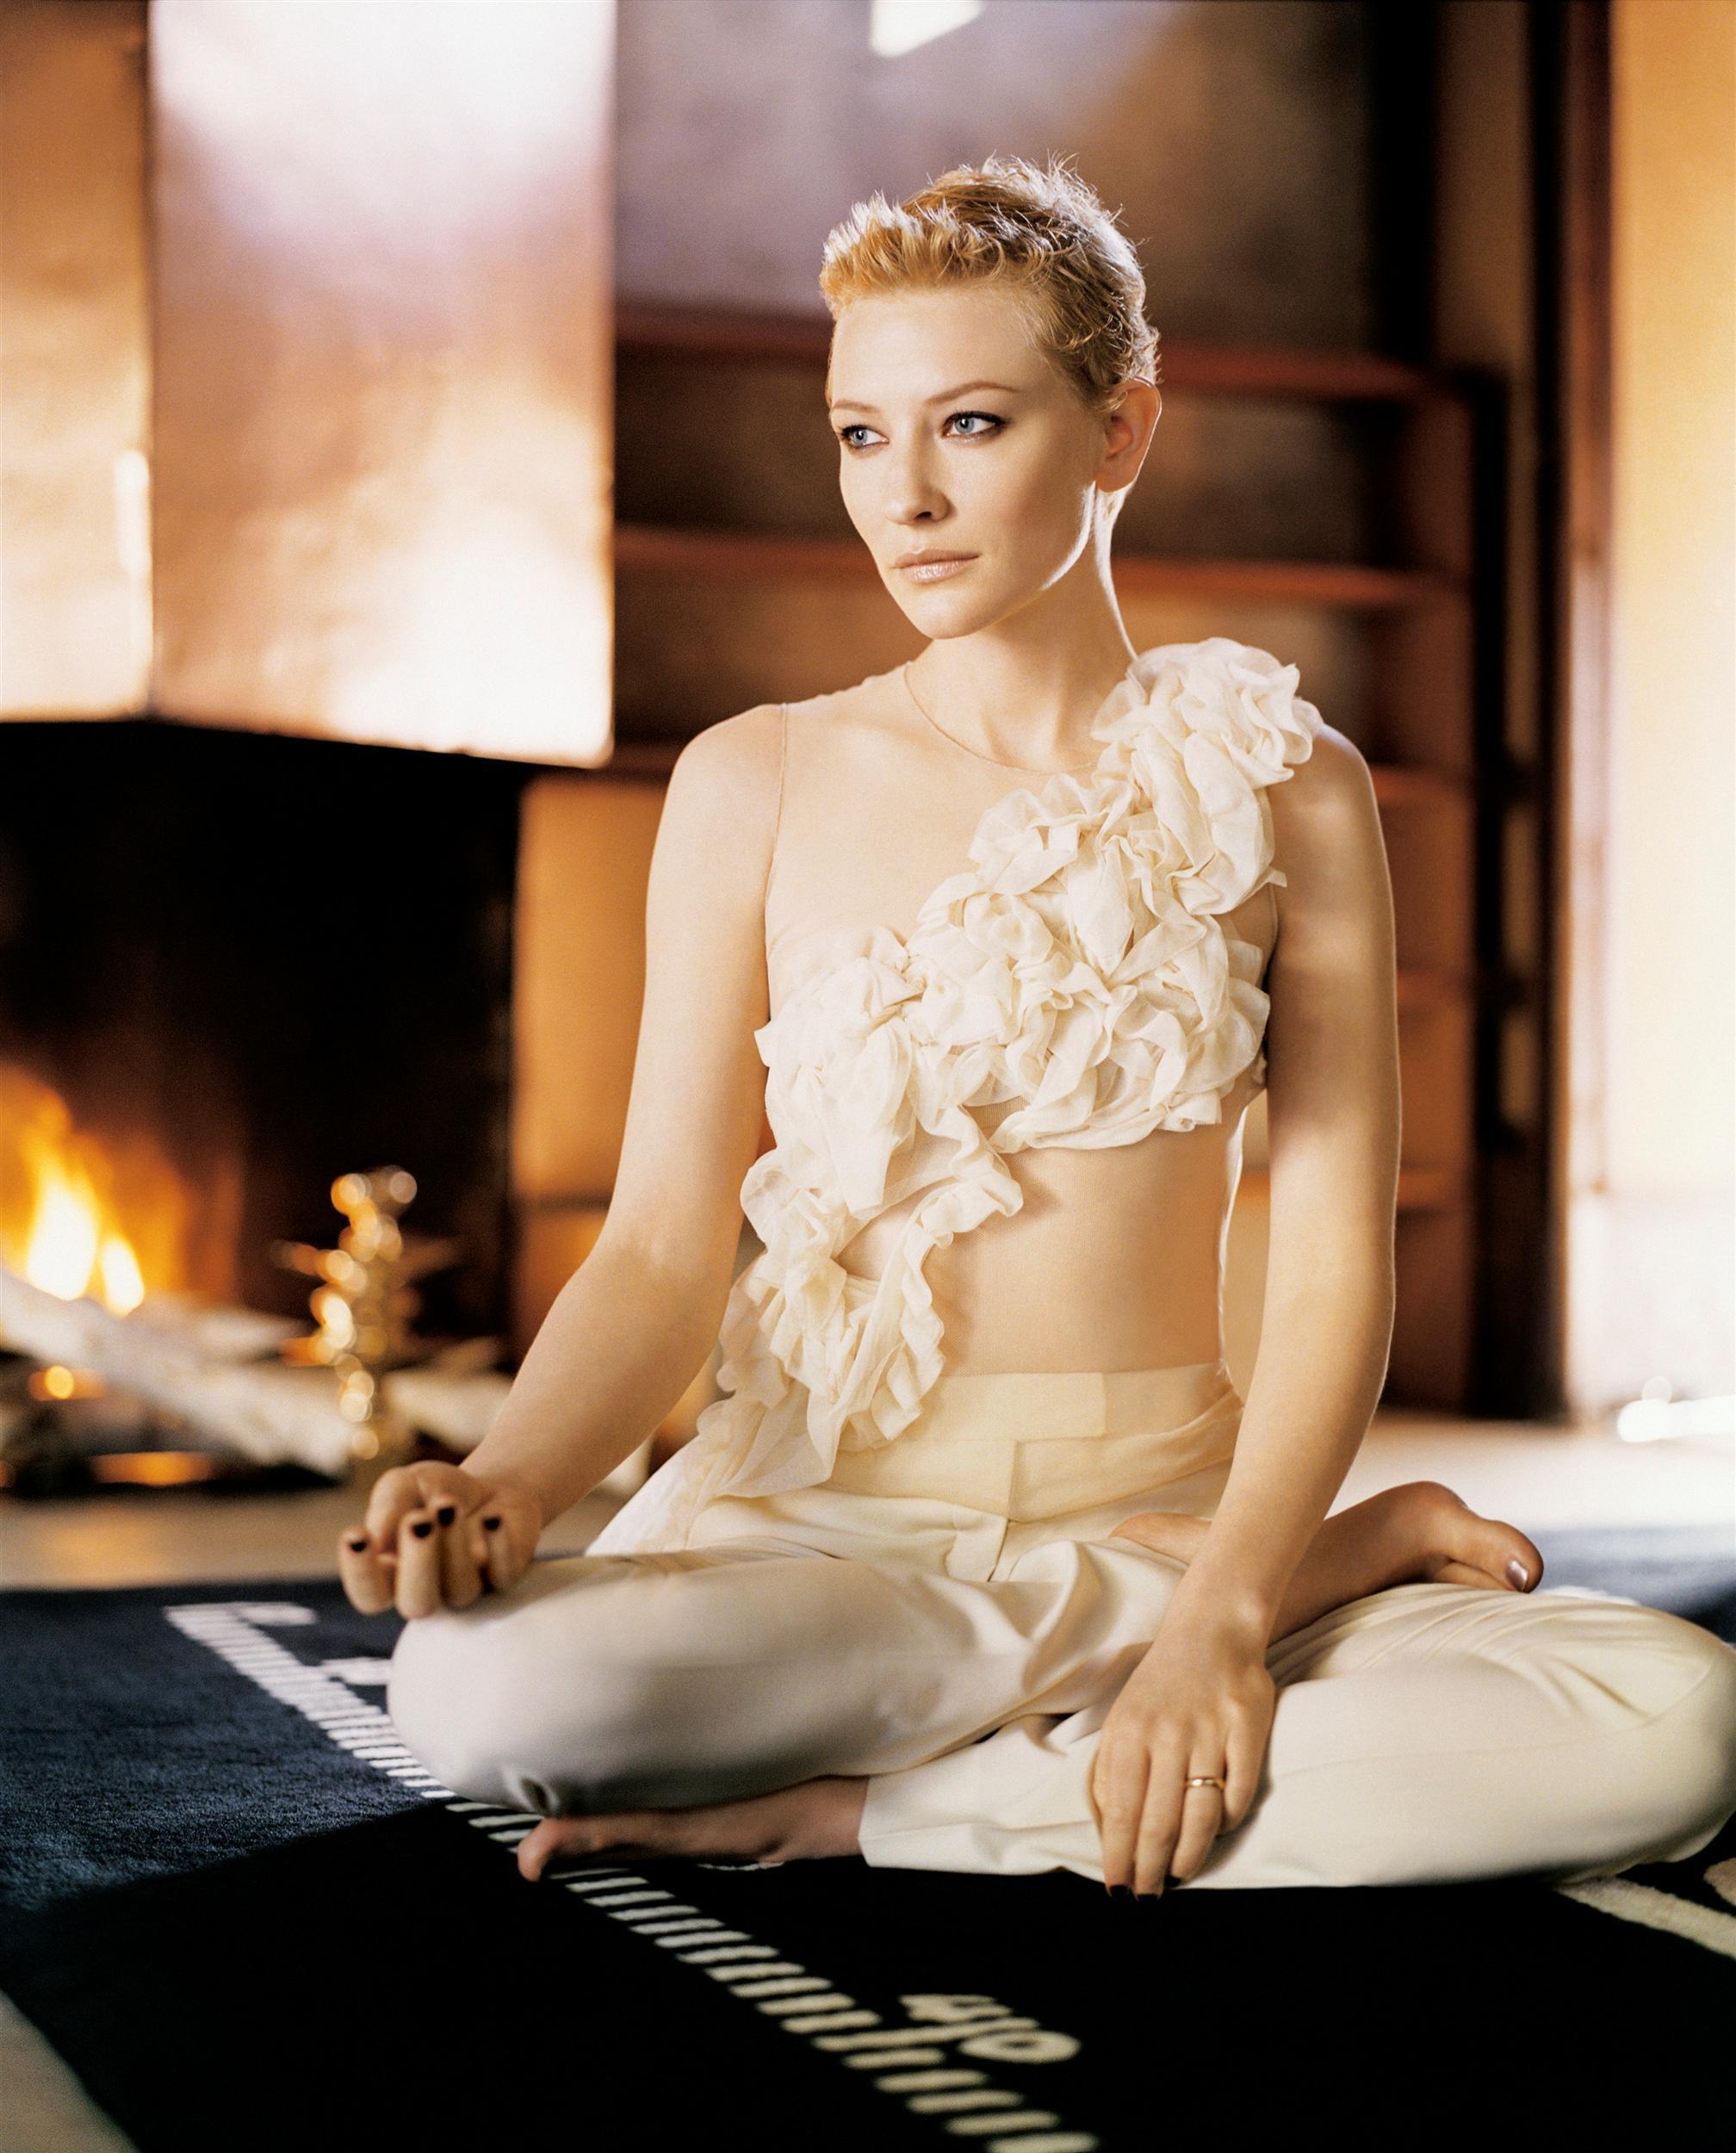 Fotos De Cate Blanchett Desnuda Fotos De Famosastk